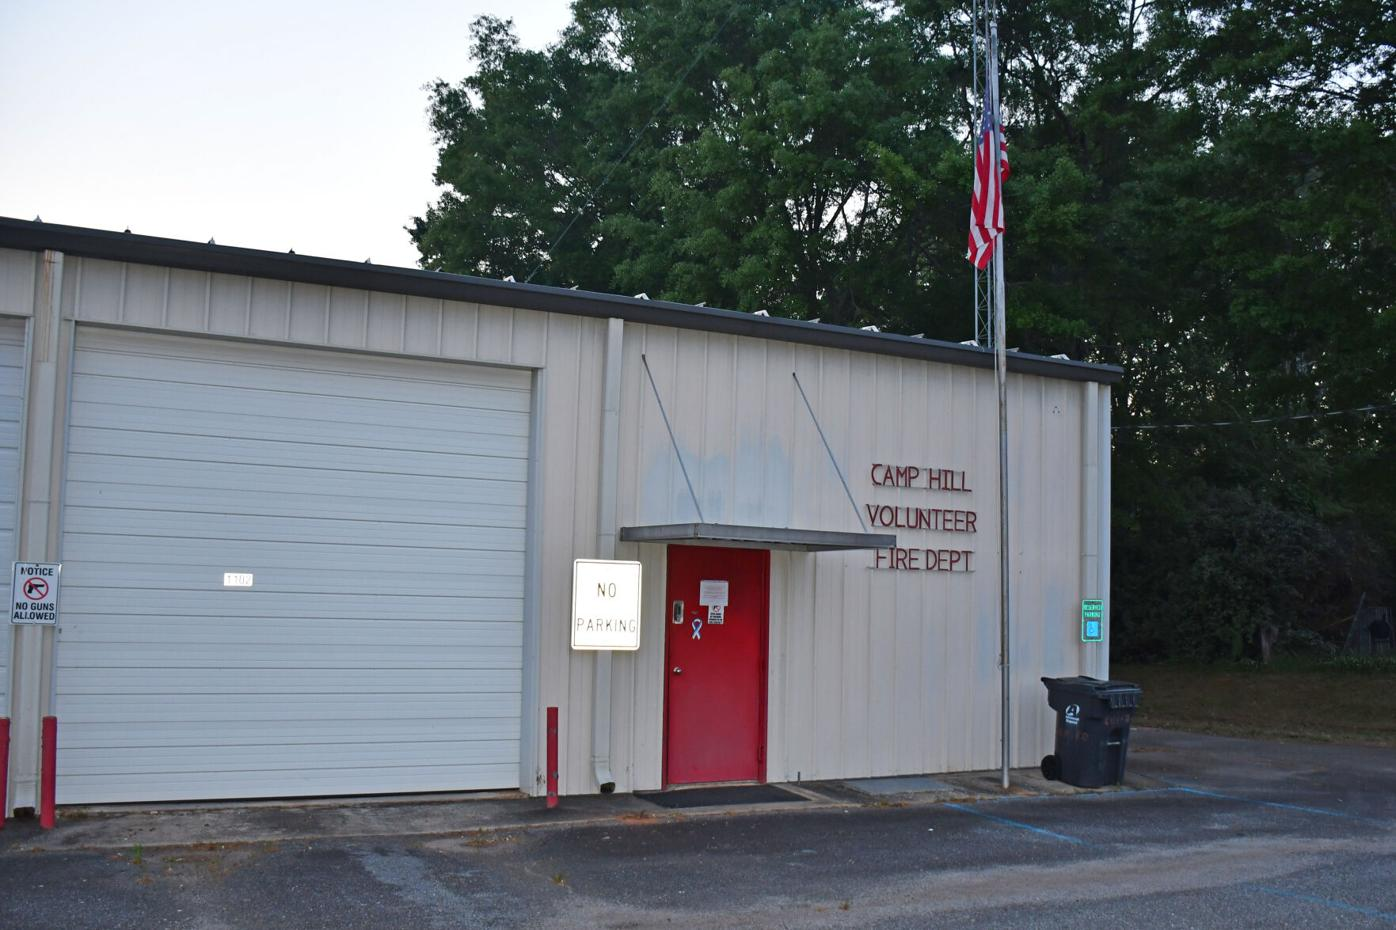 Camp Hill Volunteer Fire Department